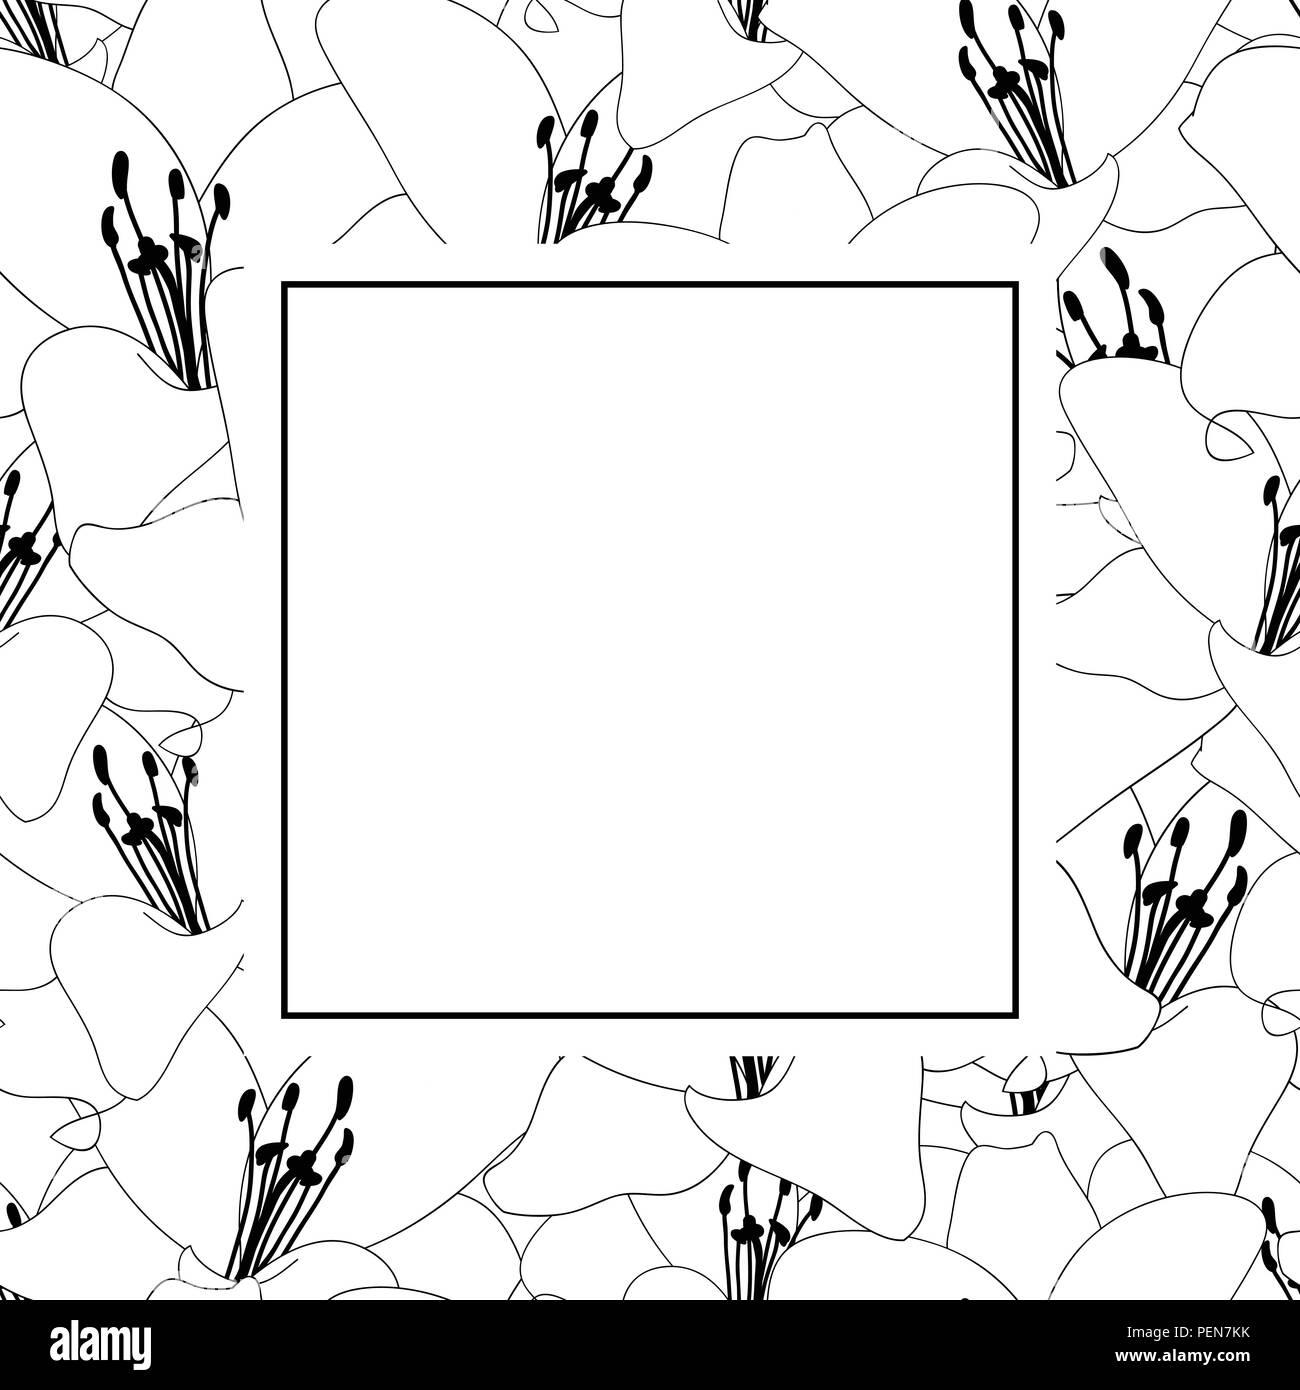 Lily Flower Outline Banner Card Vector Illustration Stock Vector